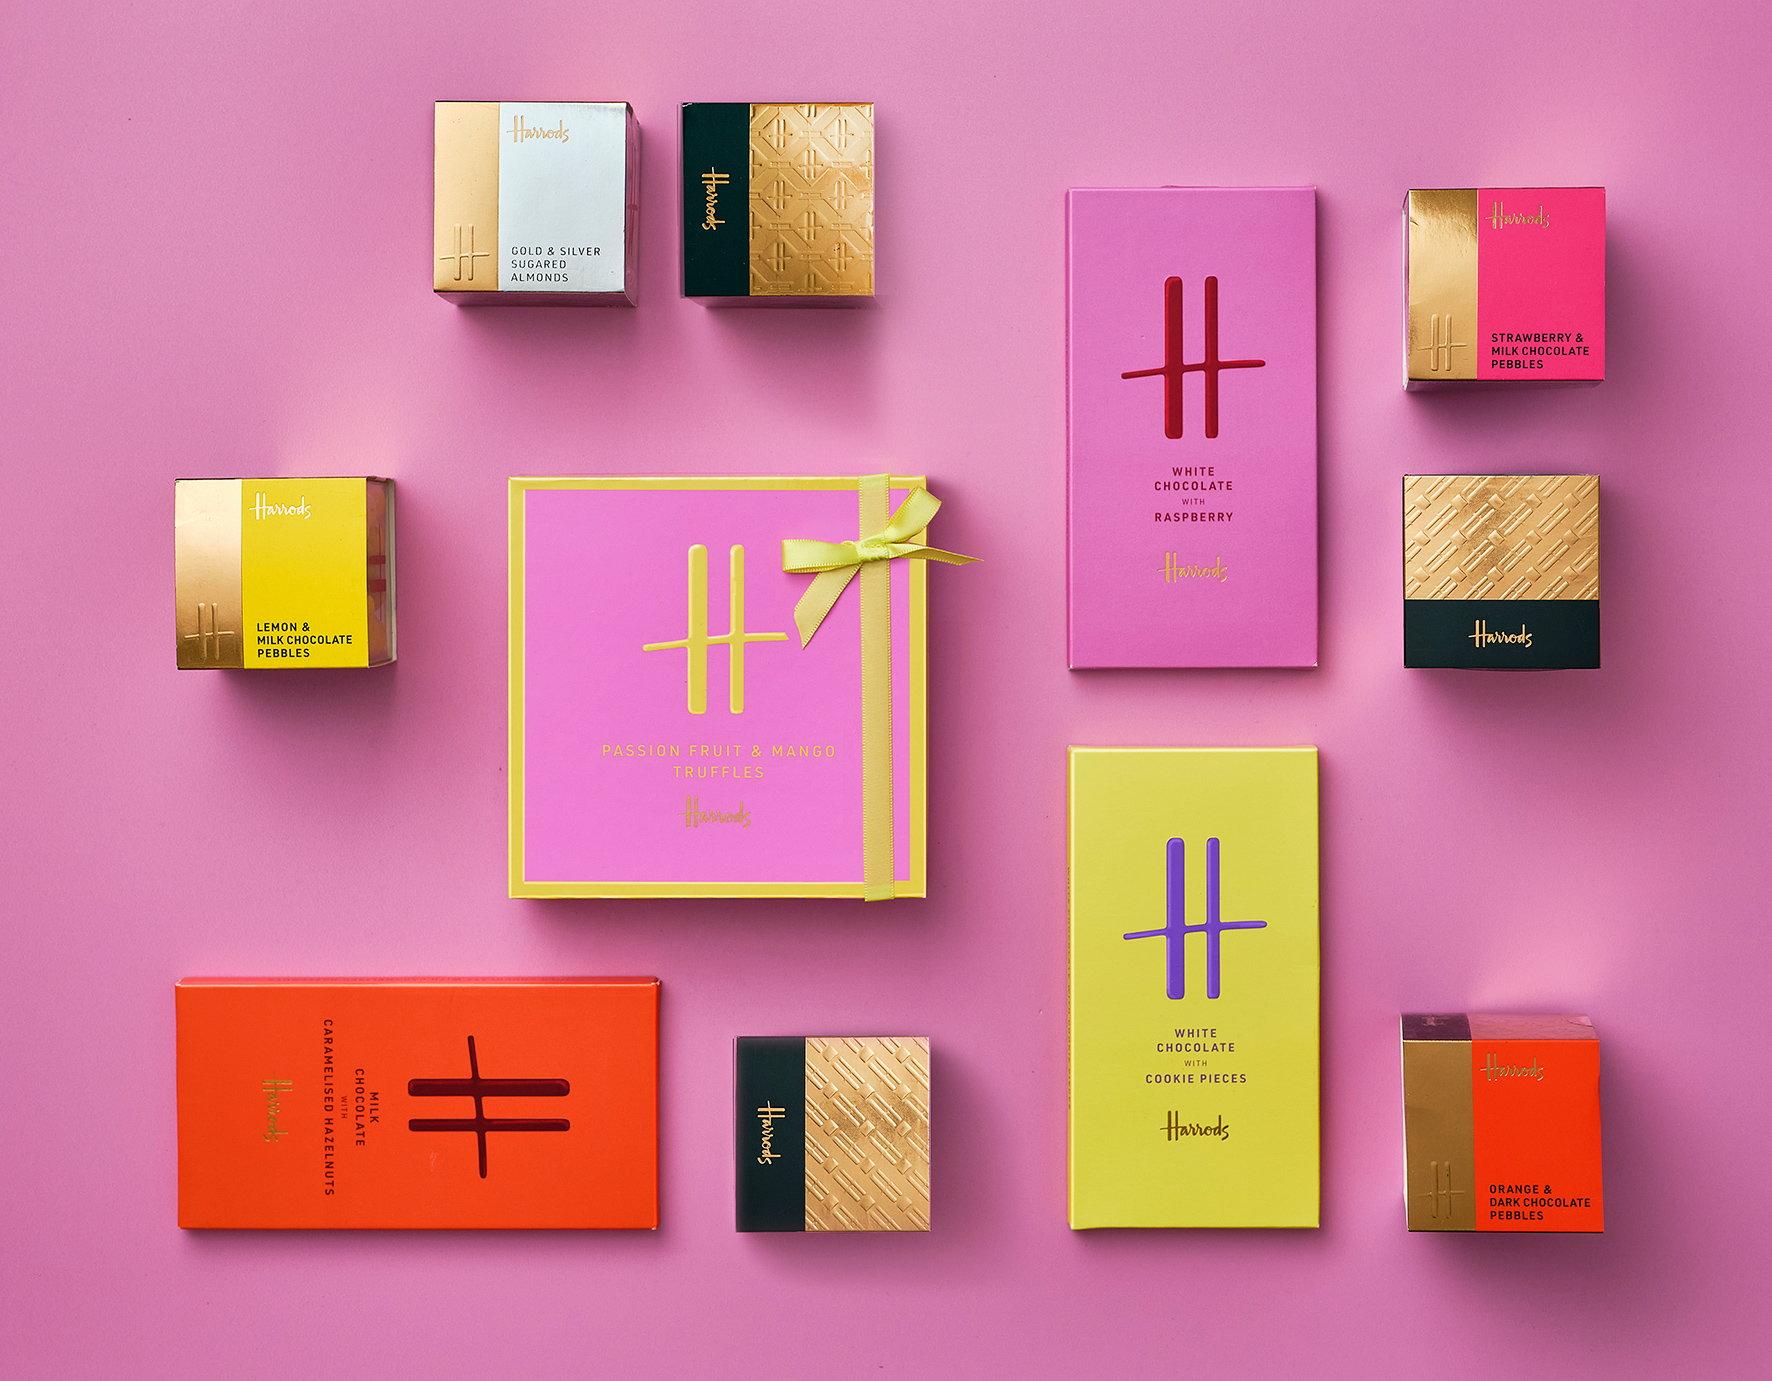 Smith&+Village's Bold, Modern Take on the Historic Harrods Mark